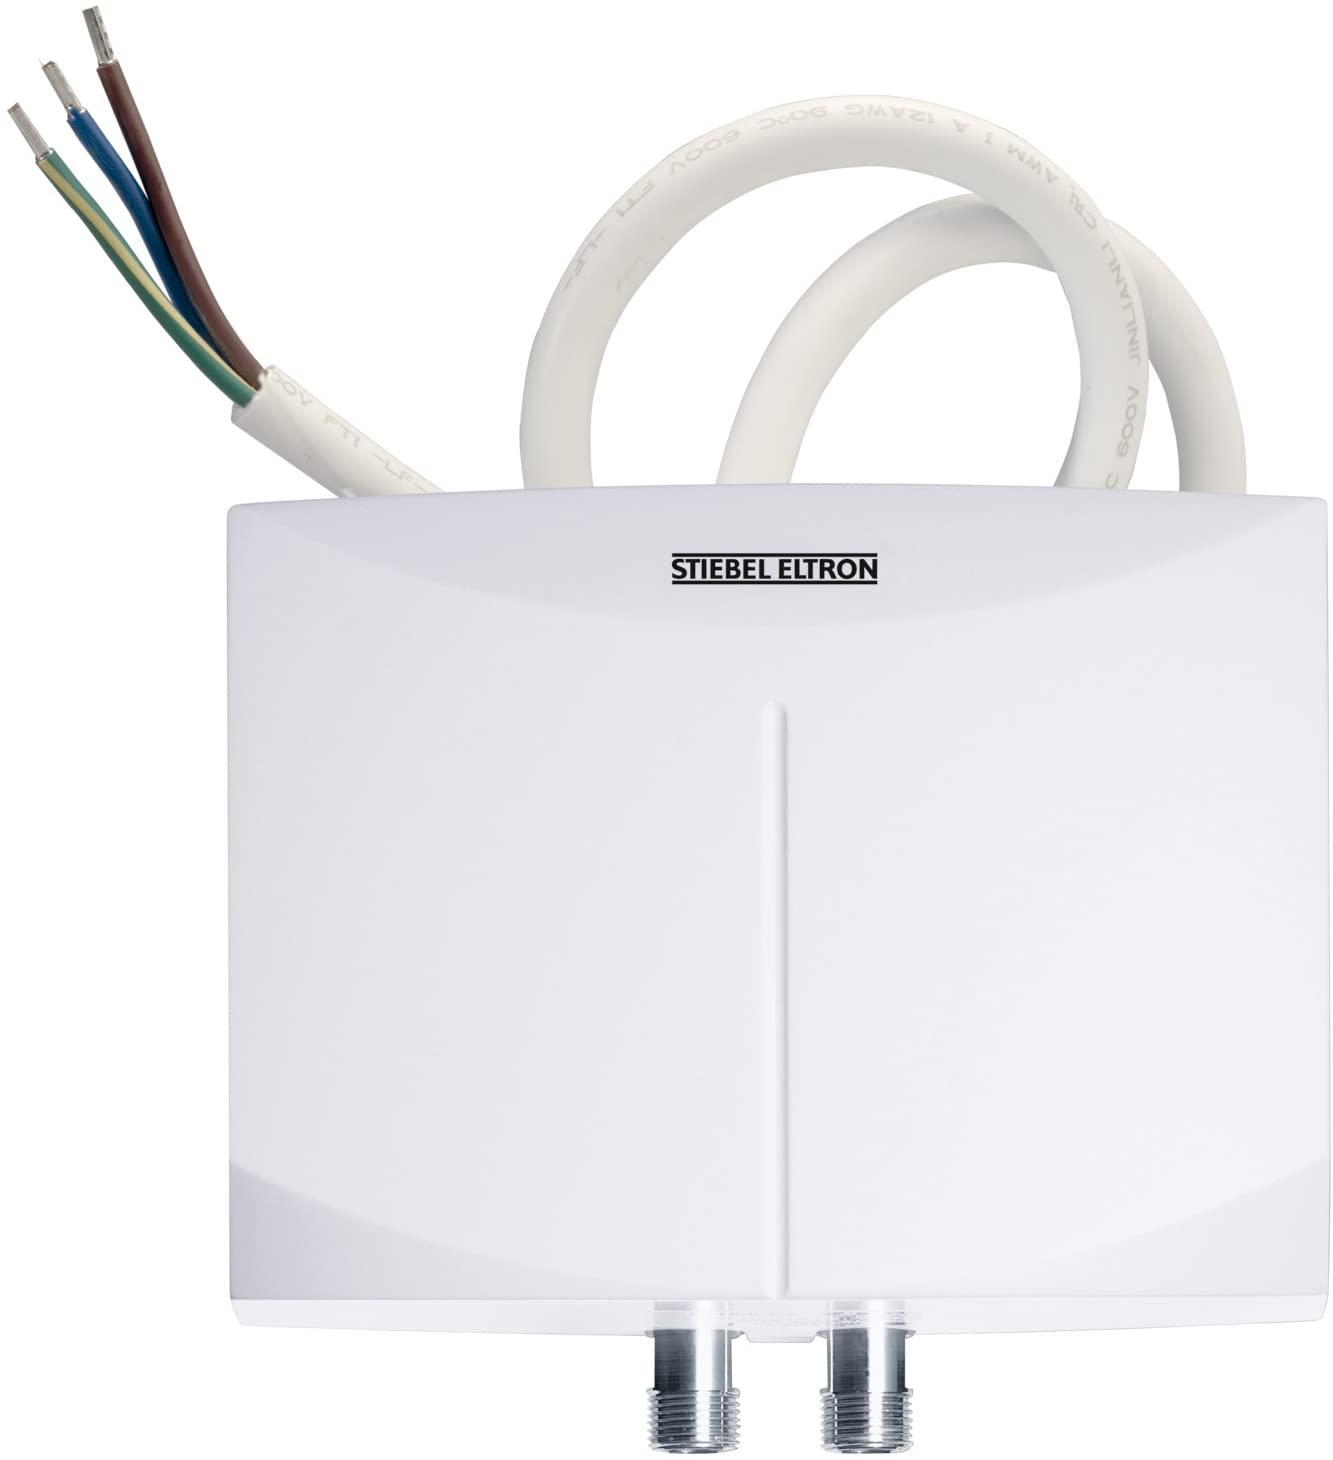 Stiebel Eltron 220816 Sink Tankless Electric Water Heater